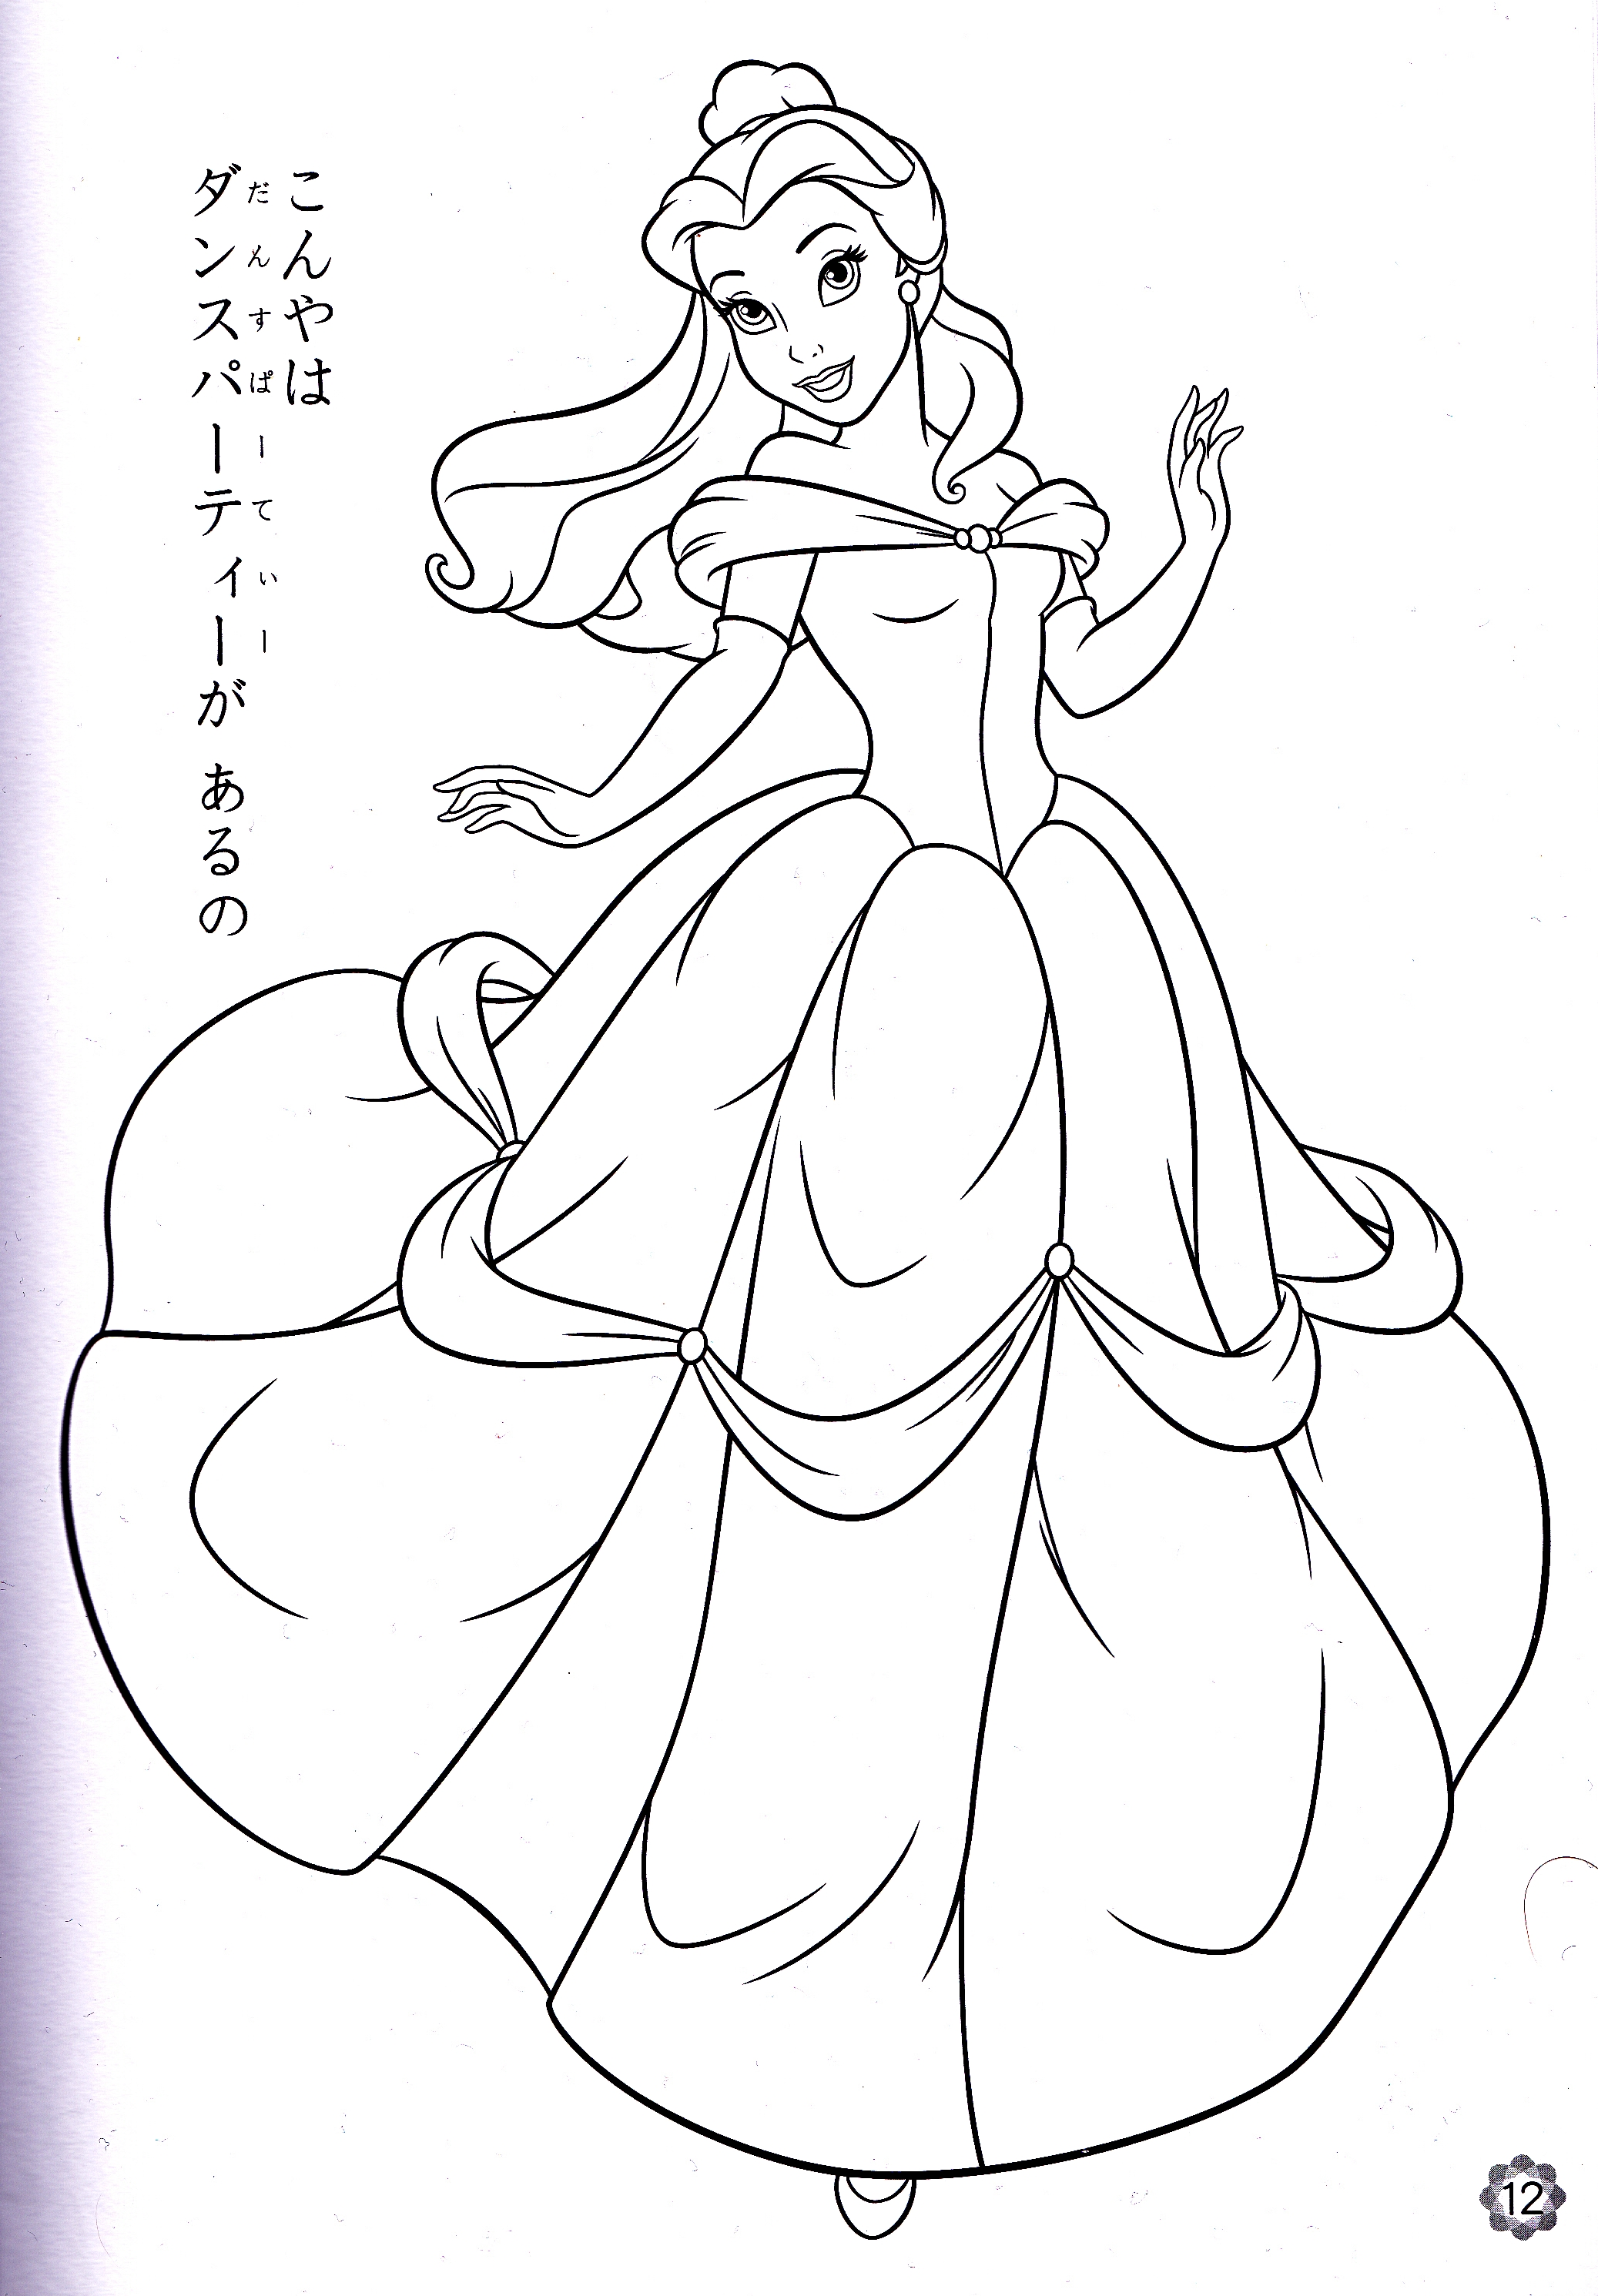 Walt Disney Coloring Pages Princess Belle Karakter Walt Disney Foto 34502962 Fanpop Page 4